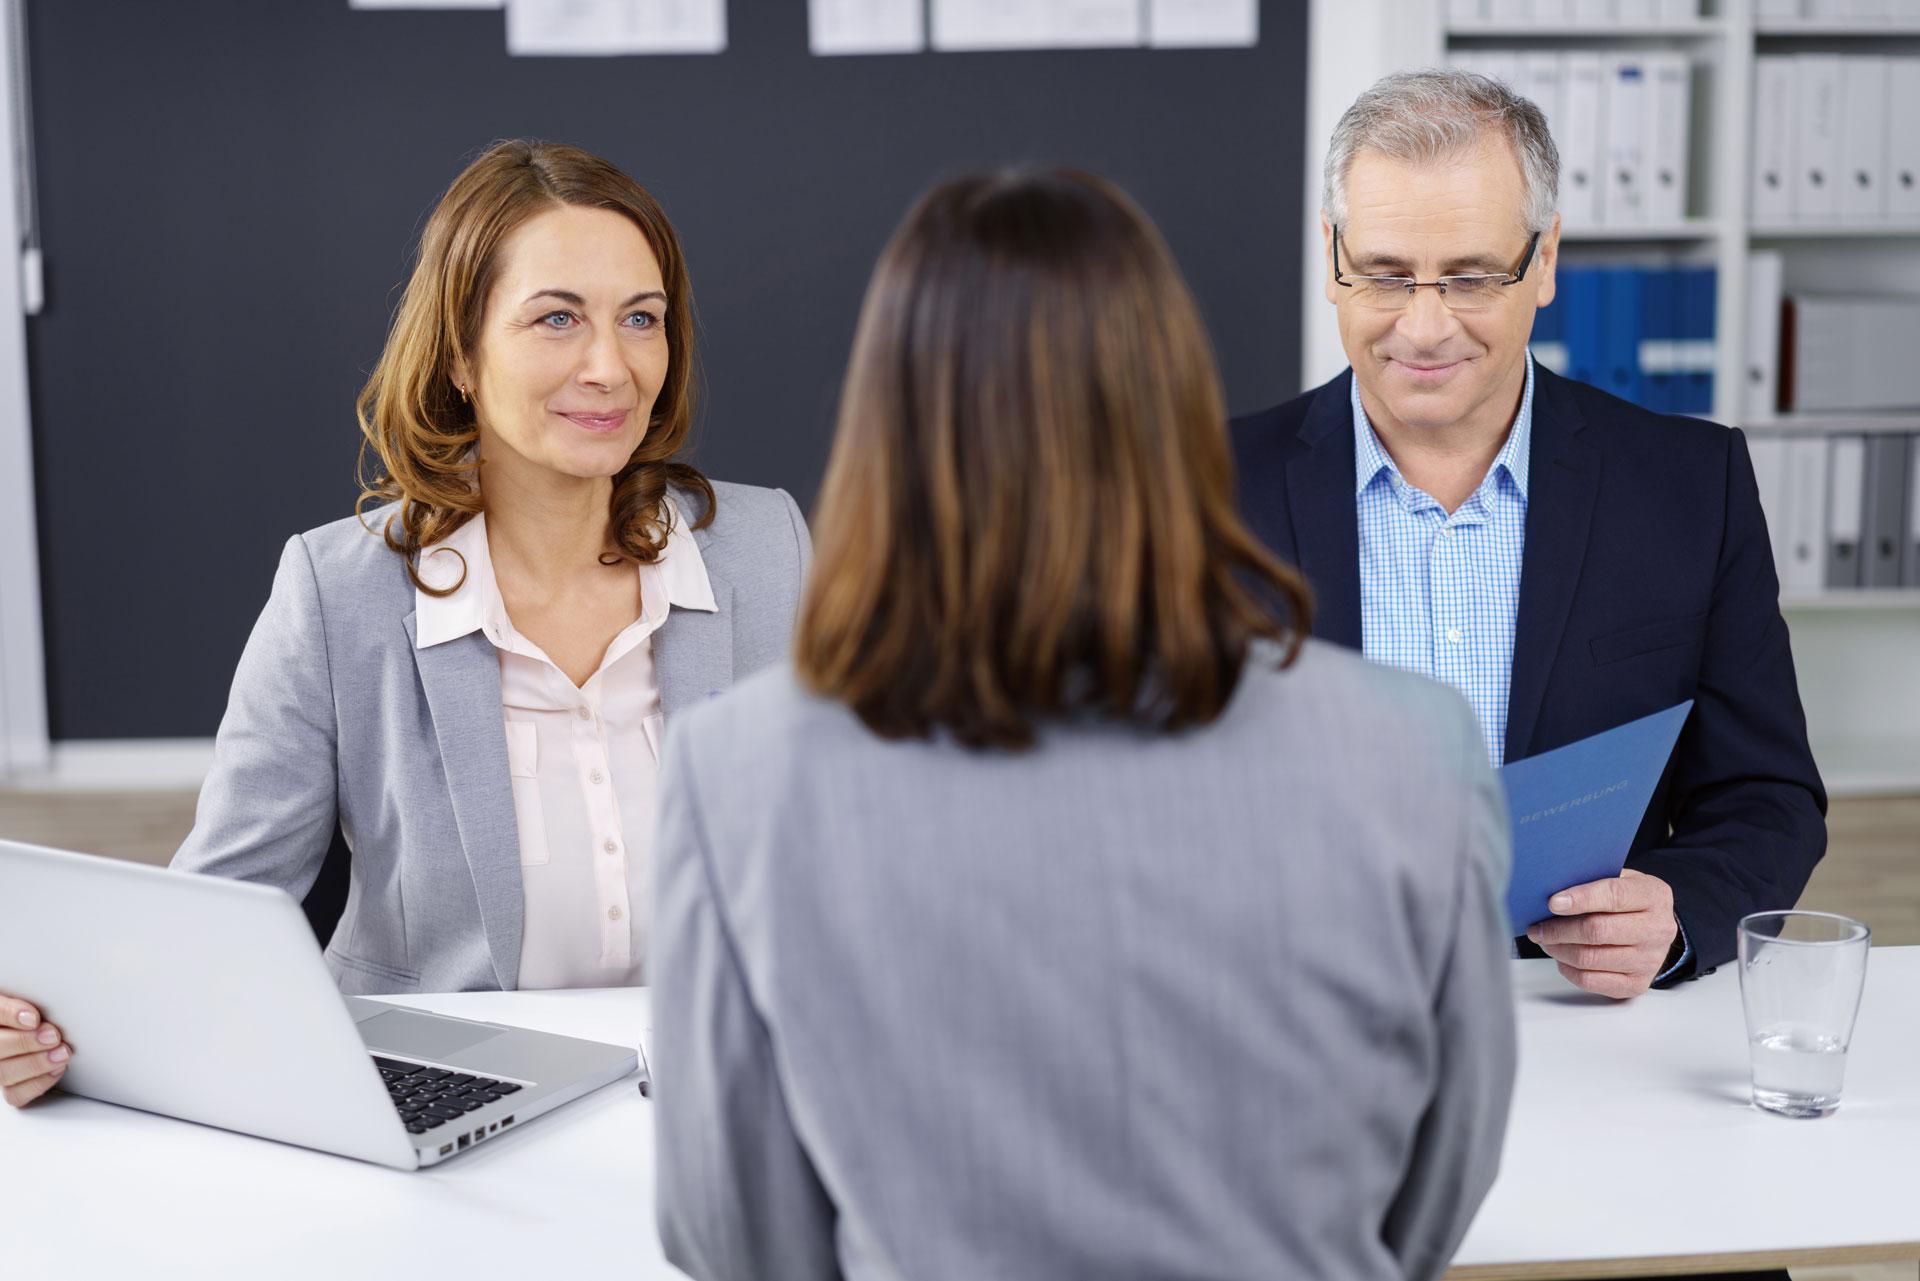 Bewerbungsgespräch-Berufung